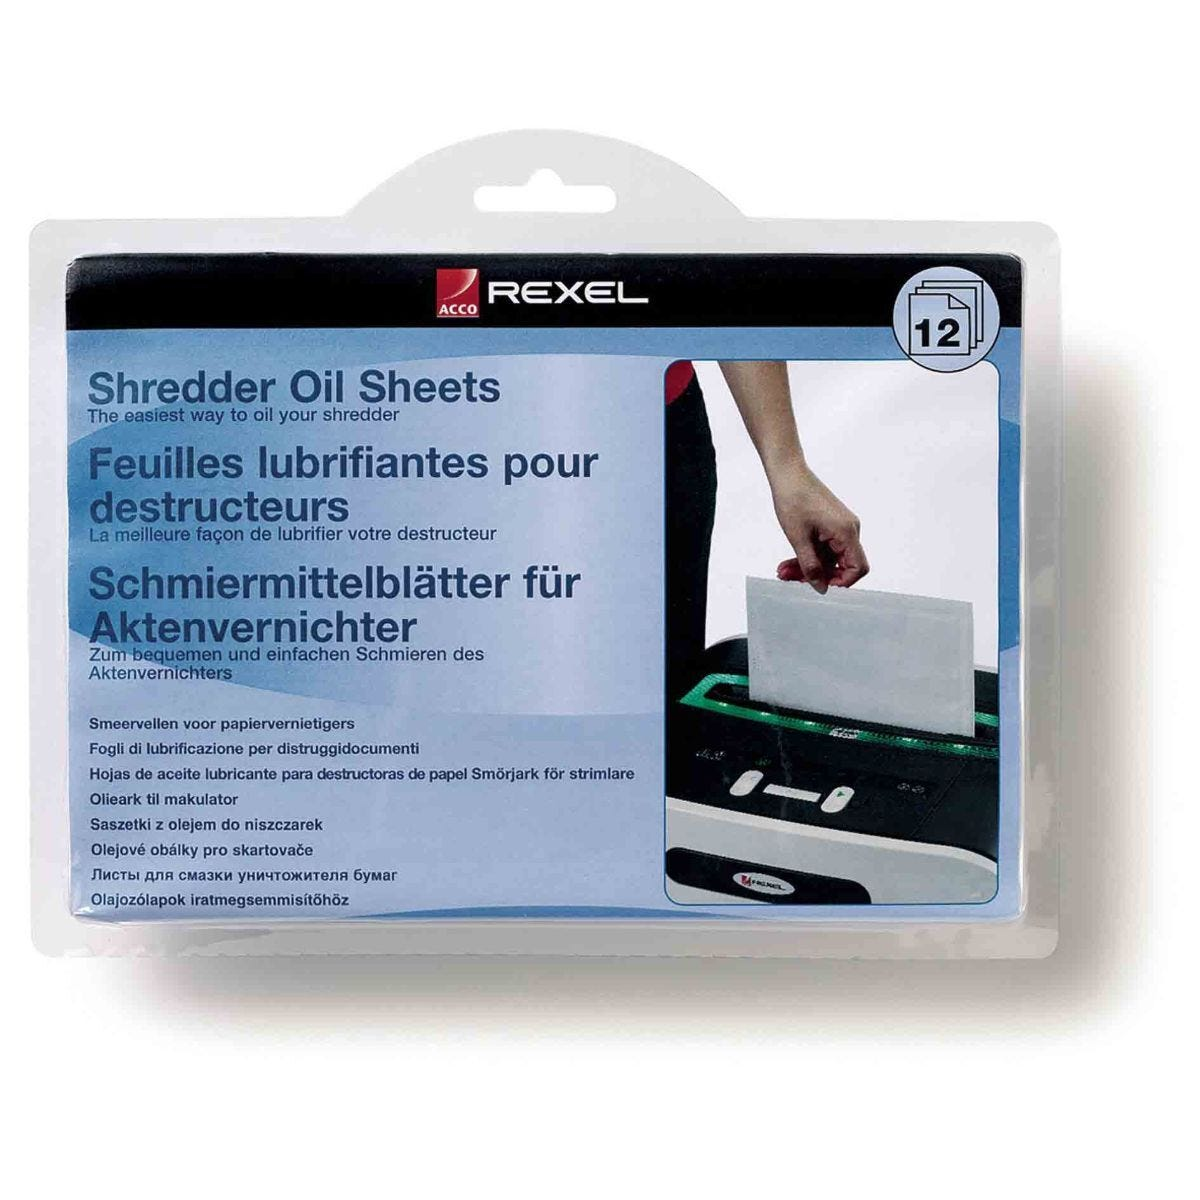 Rexel Shredder Oil Sheets Pack of 12 A5 Sheets